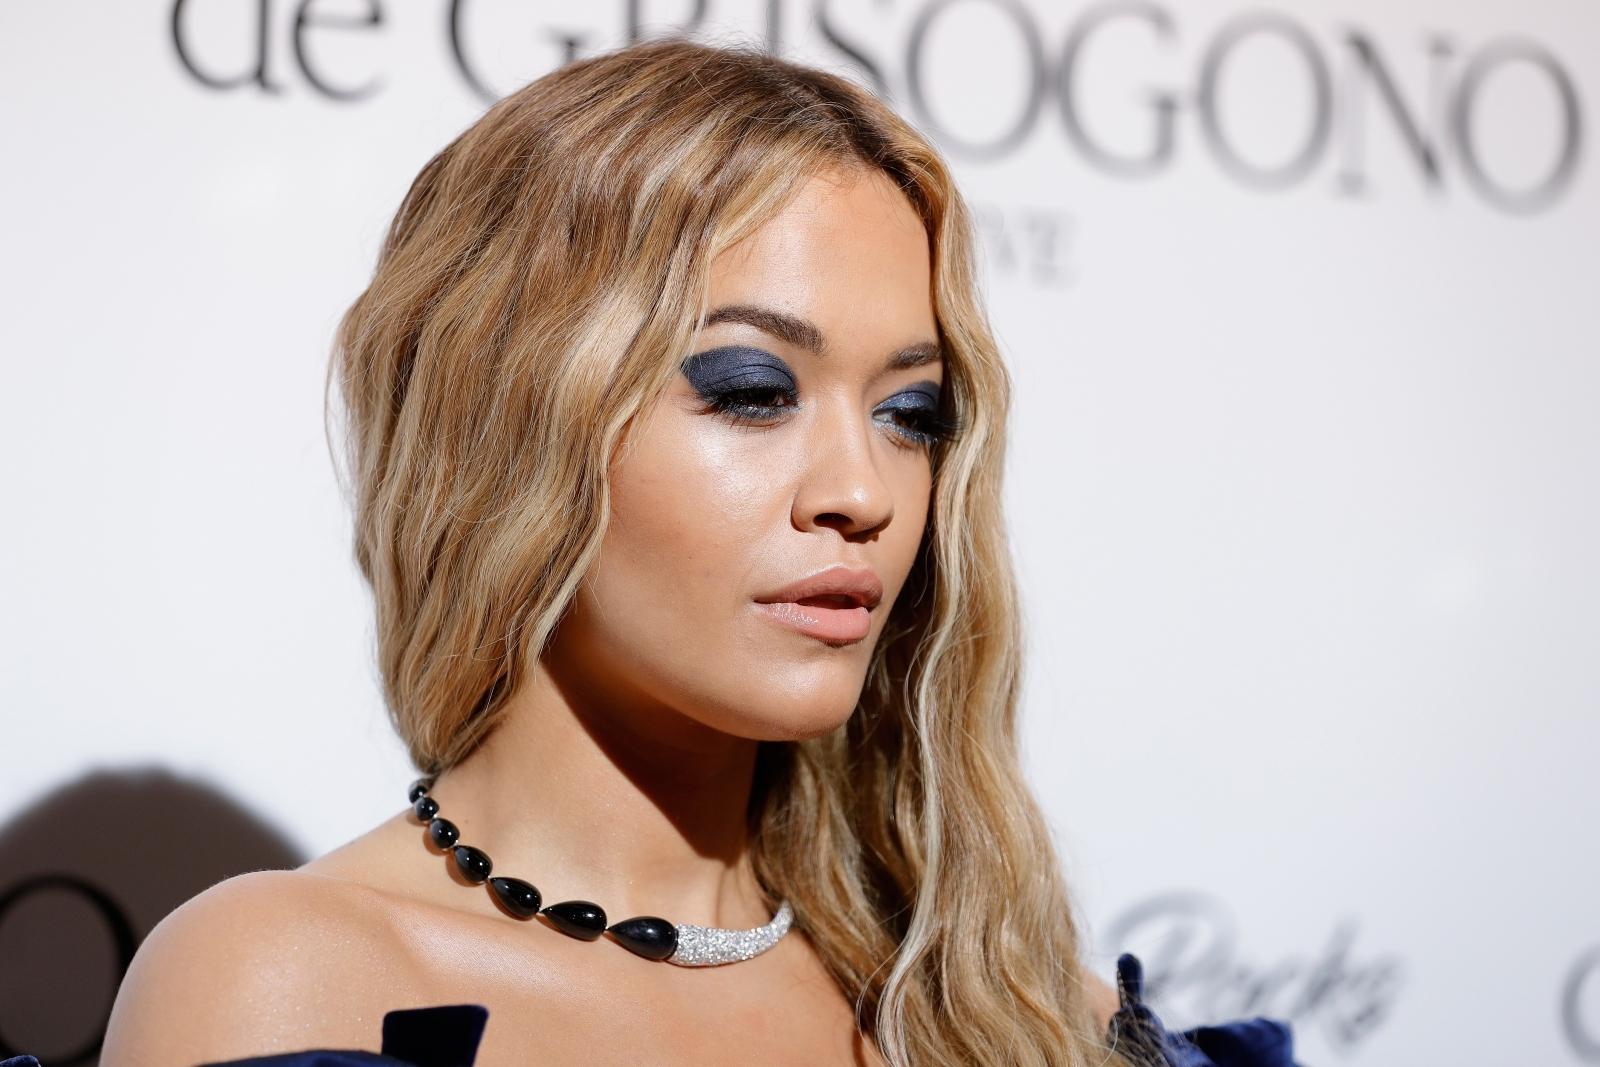 Rita Ora suffers major wardrobe malfunction in risque cleavage-baring coat